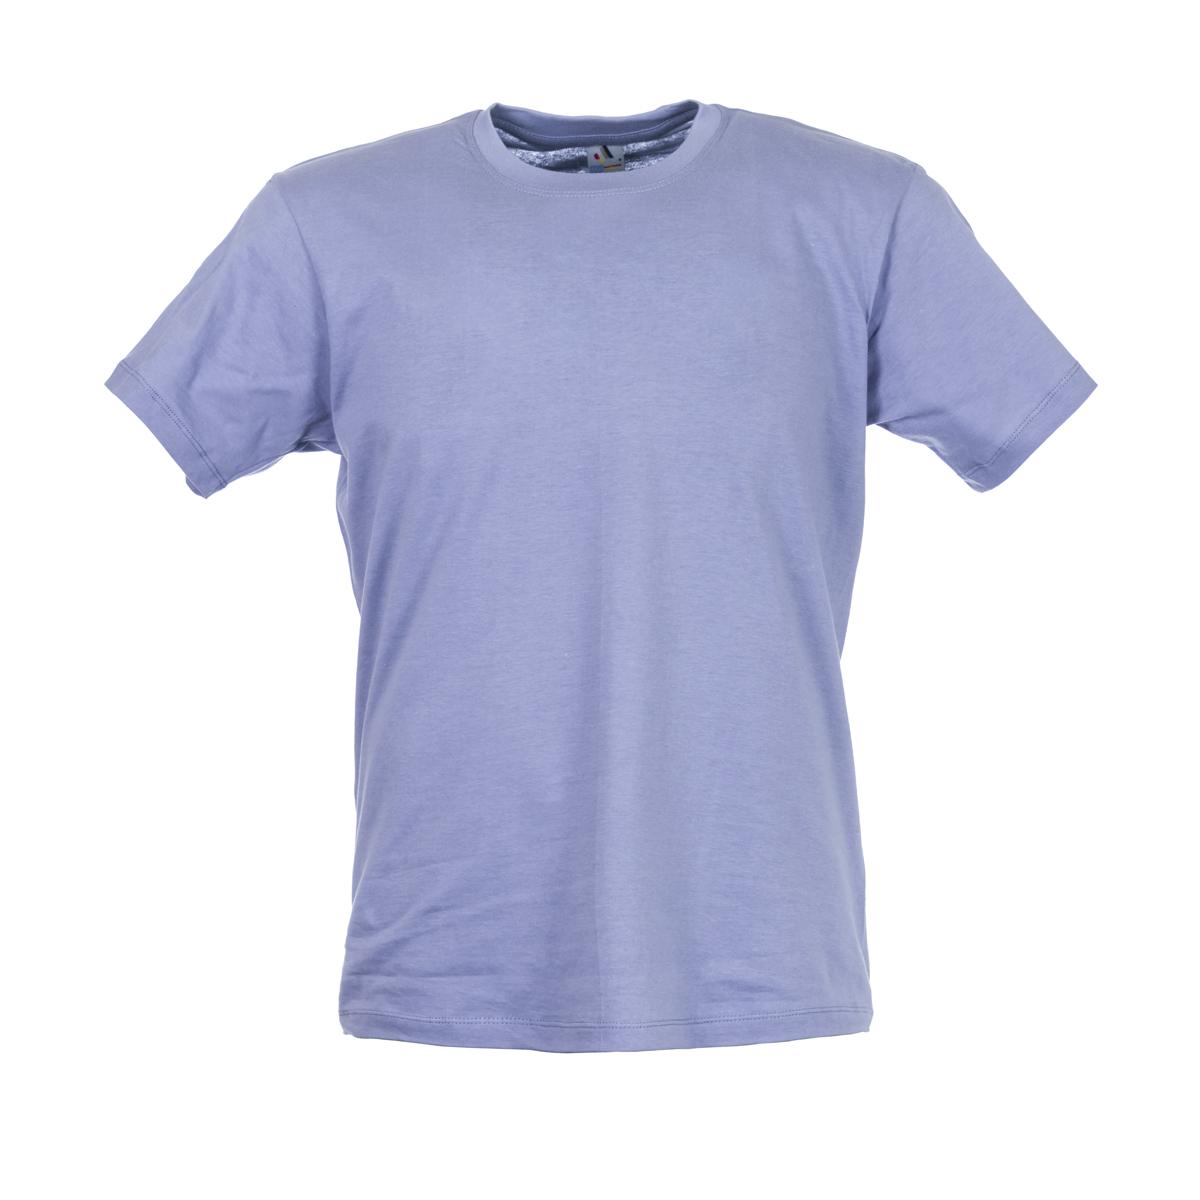 Муж. футболка арт. 04-0054 Серый р. 54Футболки и майки<br>Фактический ОГ:114 см<br>Фактический ОТ:112 см<br>Фактический ОБ:112 см<br>Длина по спинке:76 см<br>Рост:178-188 см<br><br>Тип: Муж. футболка<br>Размер: 54<br>Материал: Кулирка